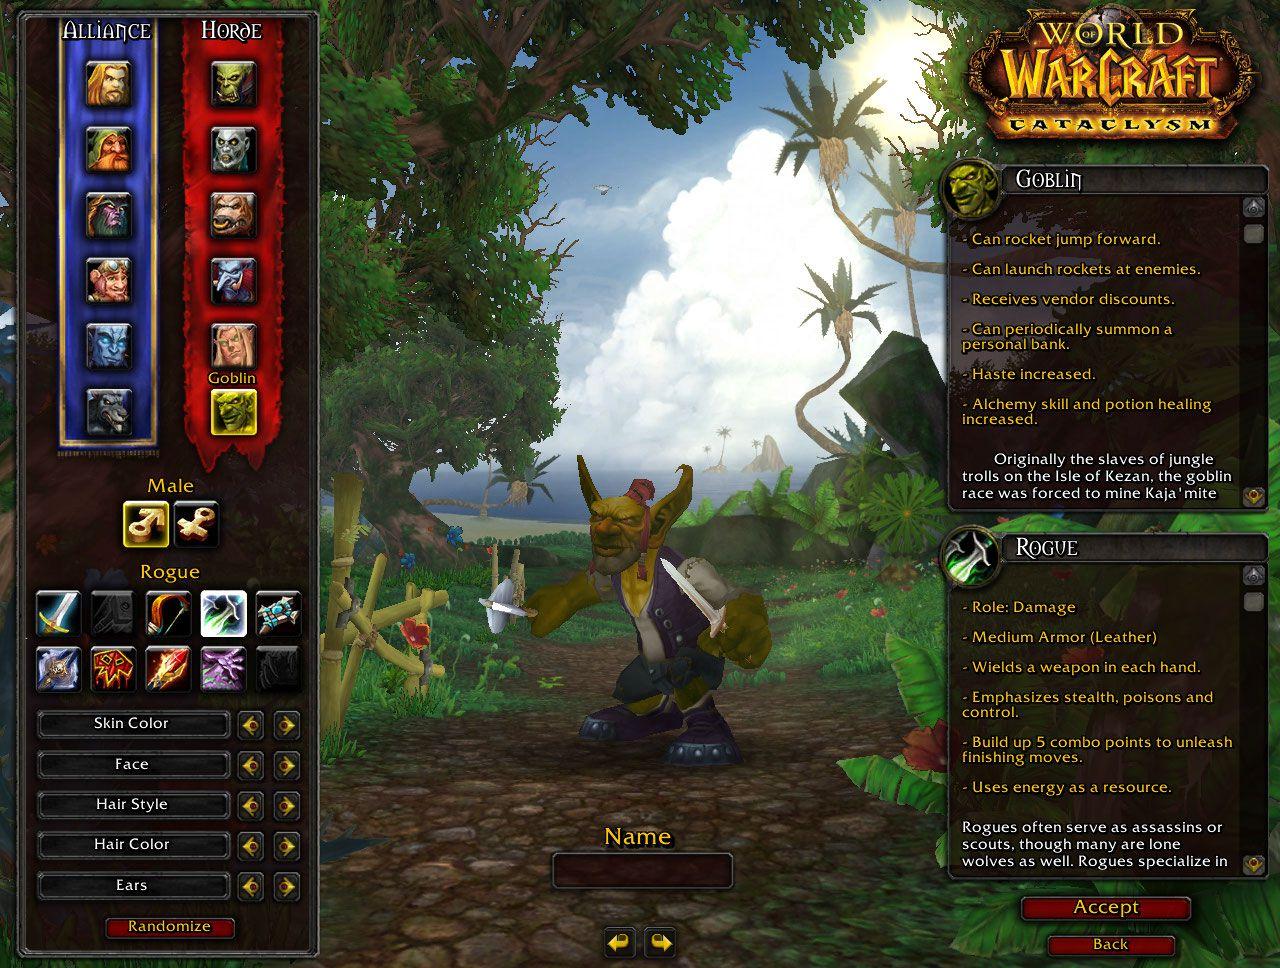 Goblin Rogue wow screenshot - Gamingcfg com